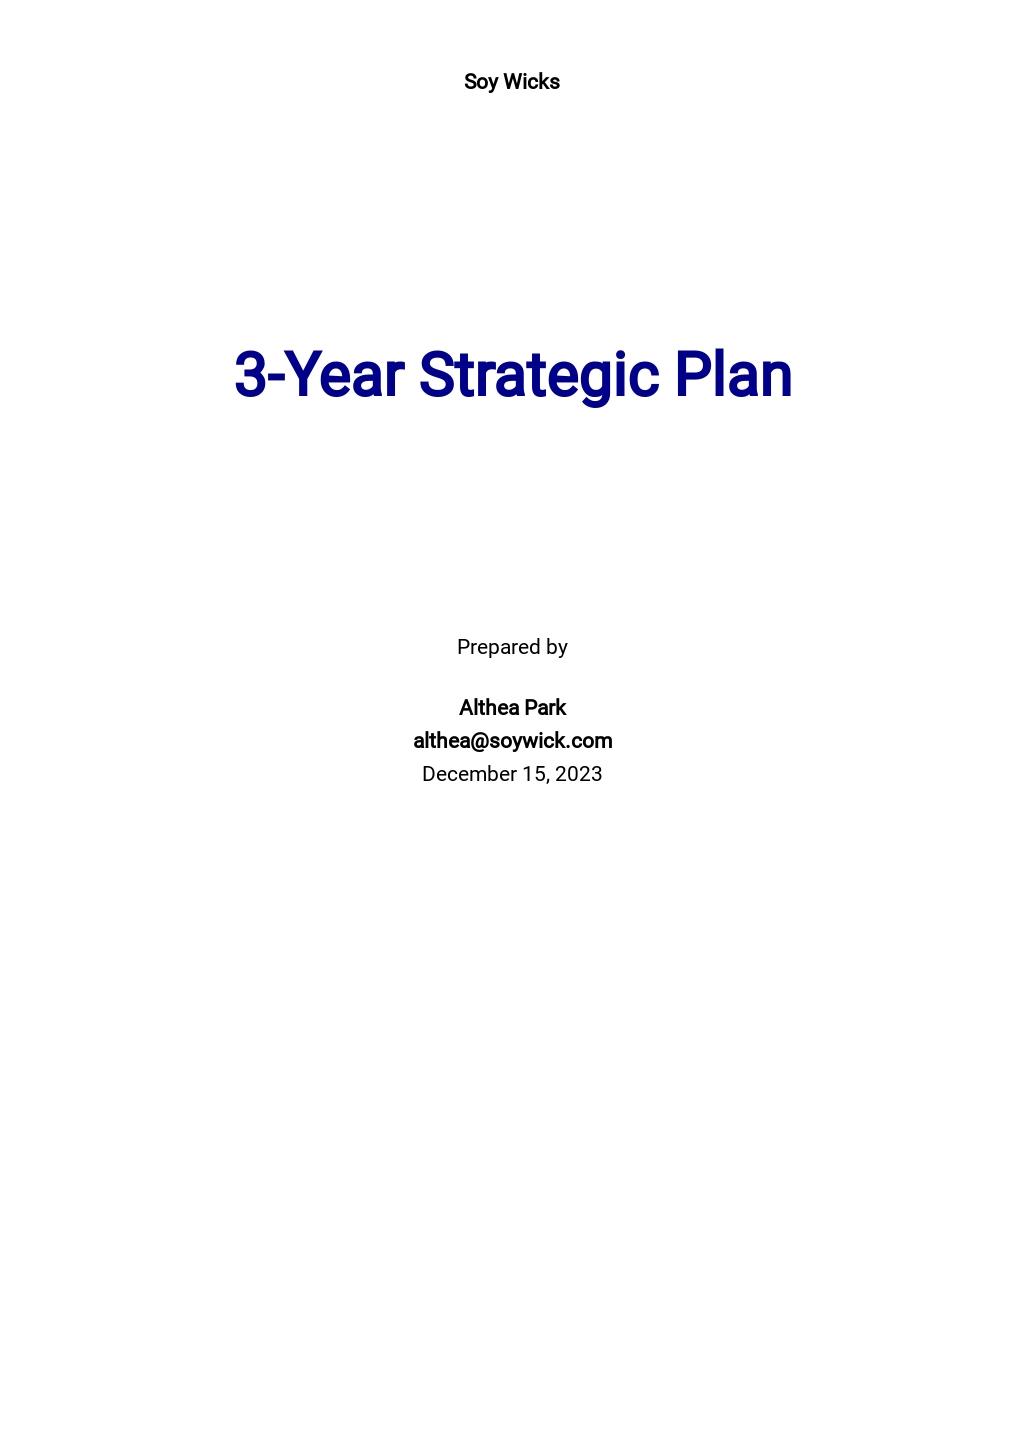 3 Year Strategic Plan Template